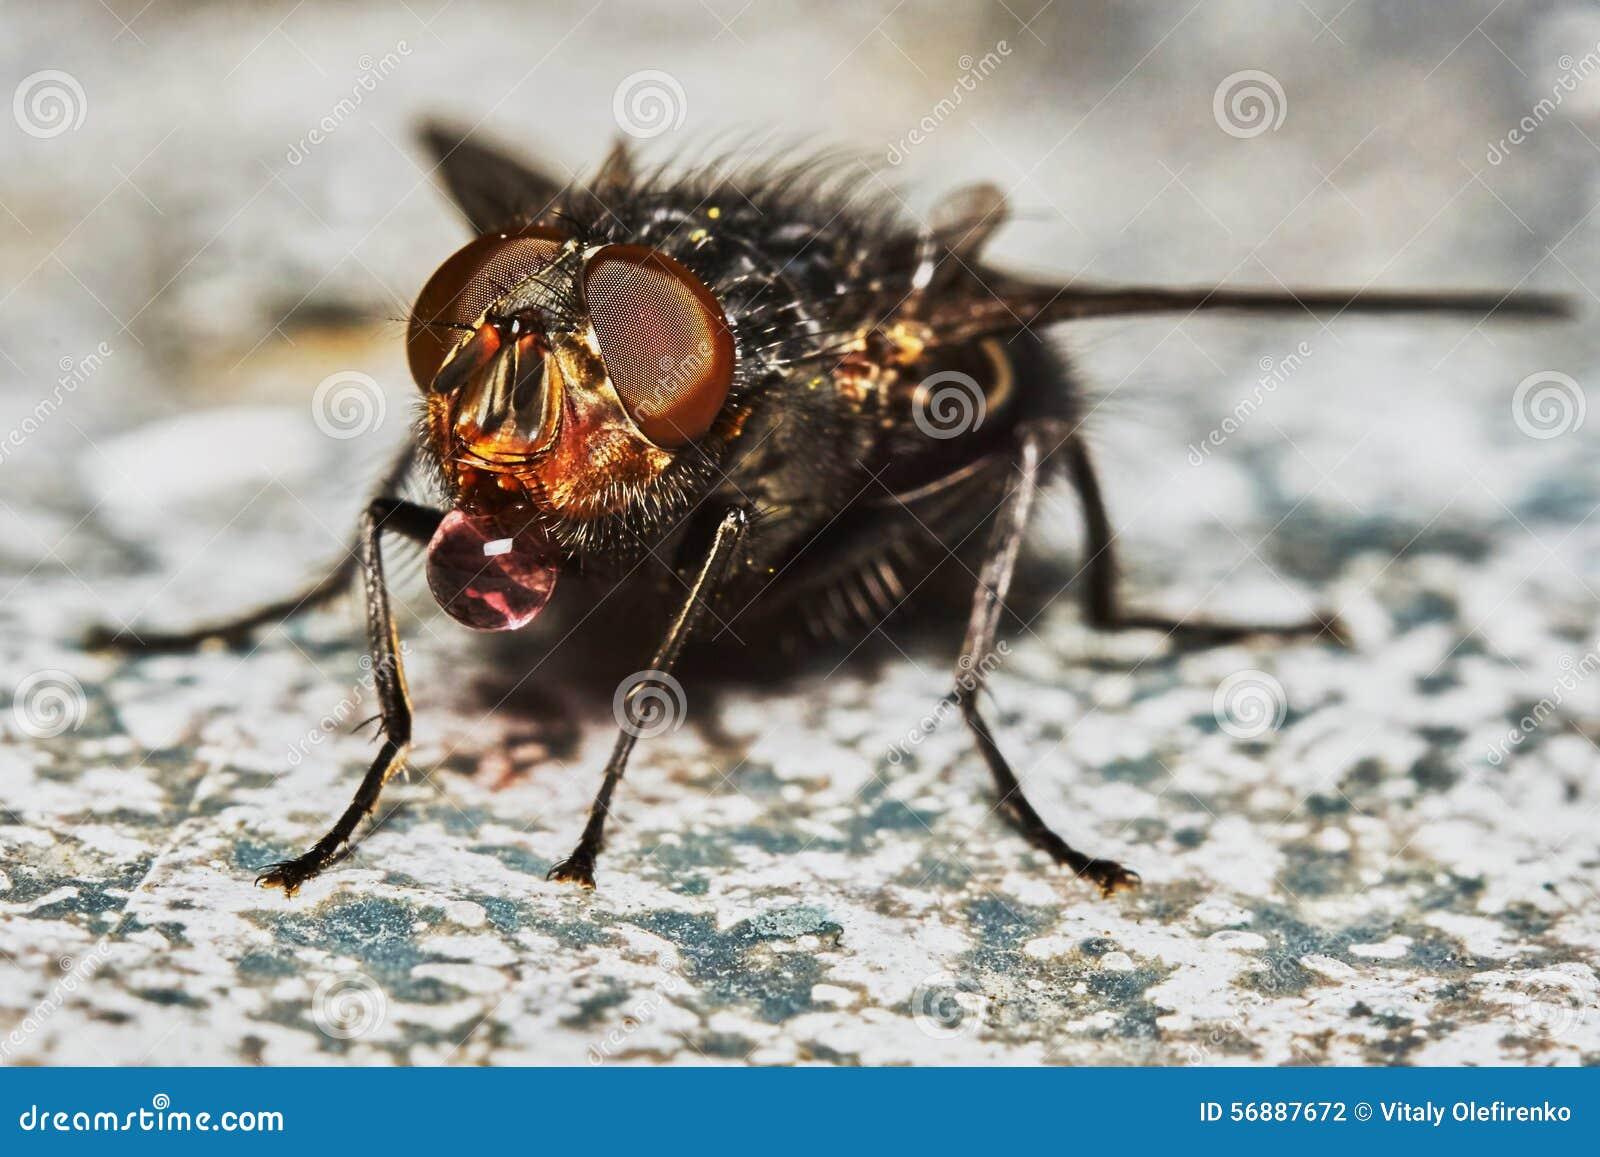 Bere grigio della mosca